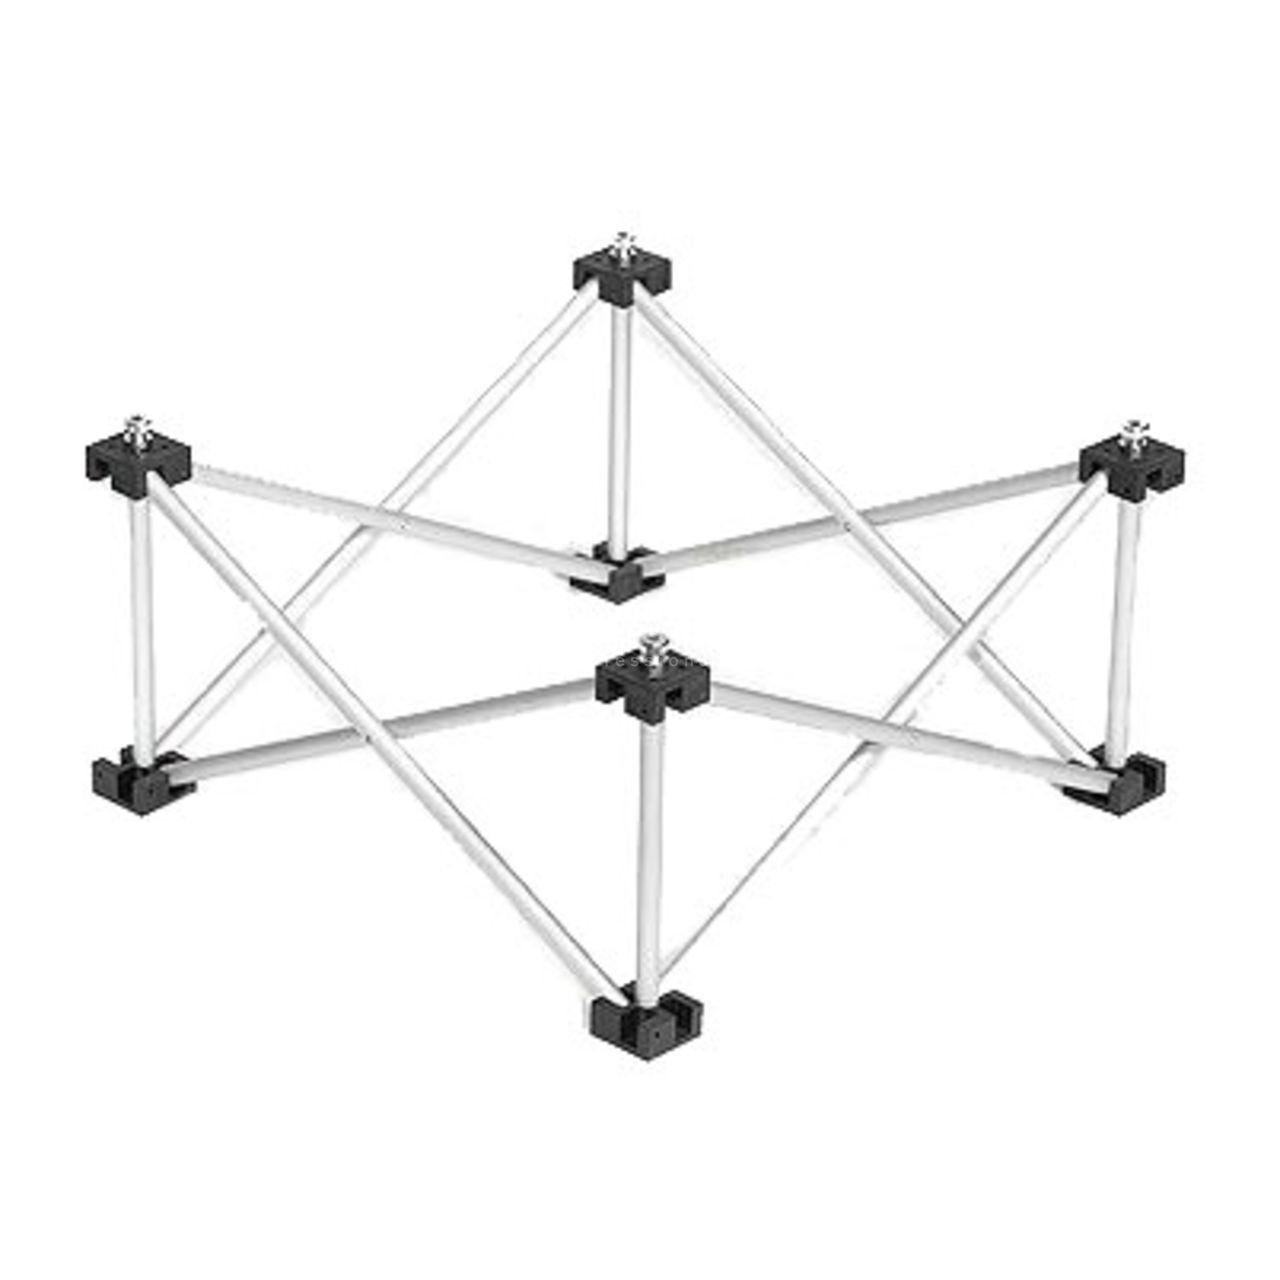 intellistage 30cm feet f 1m 60. Black Bedroom Furniture Sets. Home Design Ideas